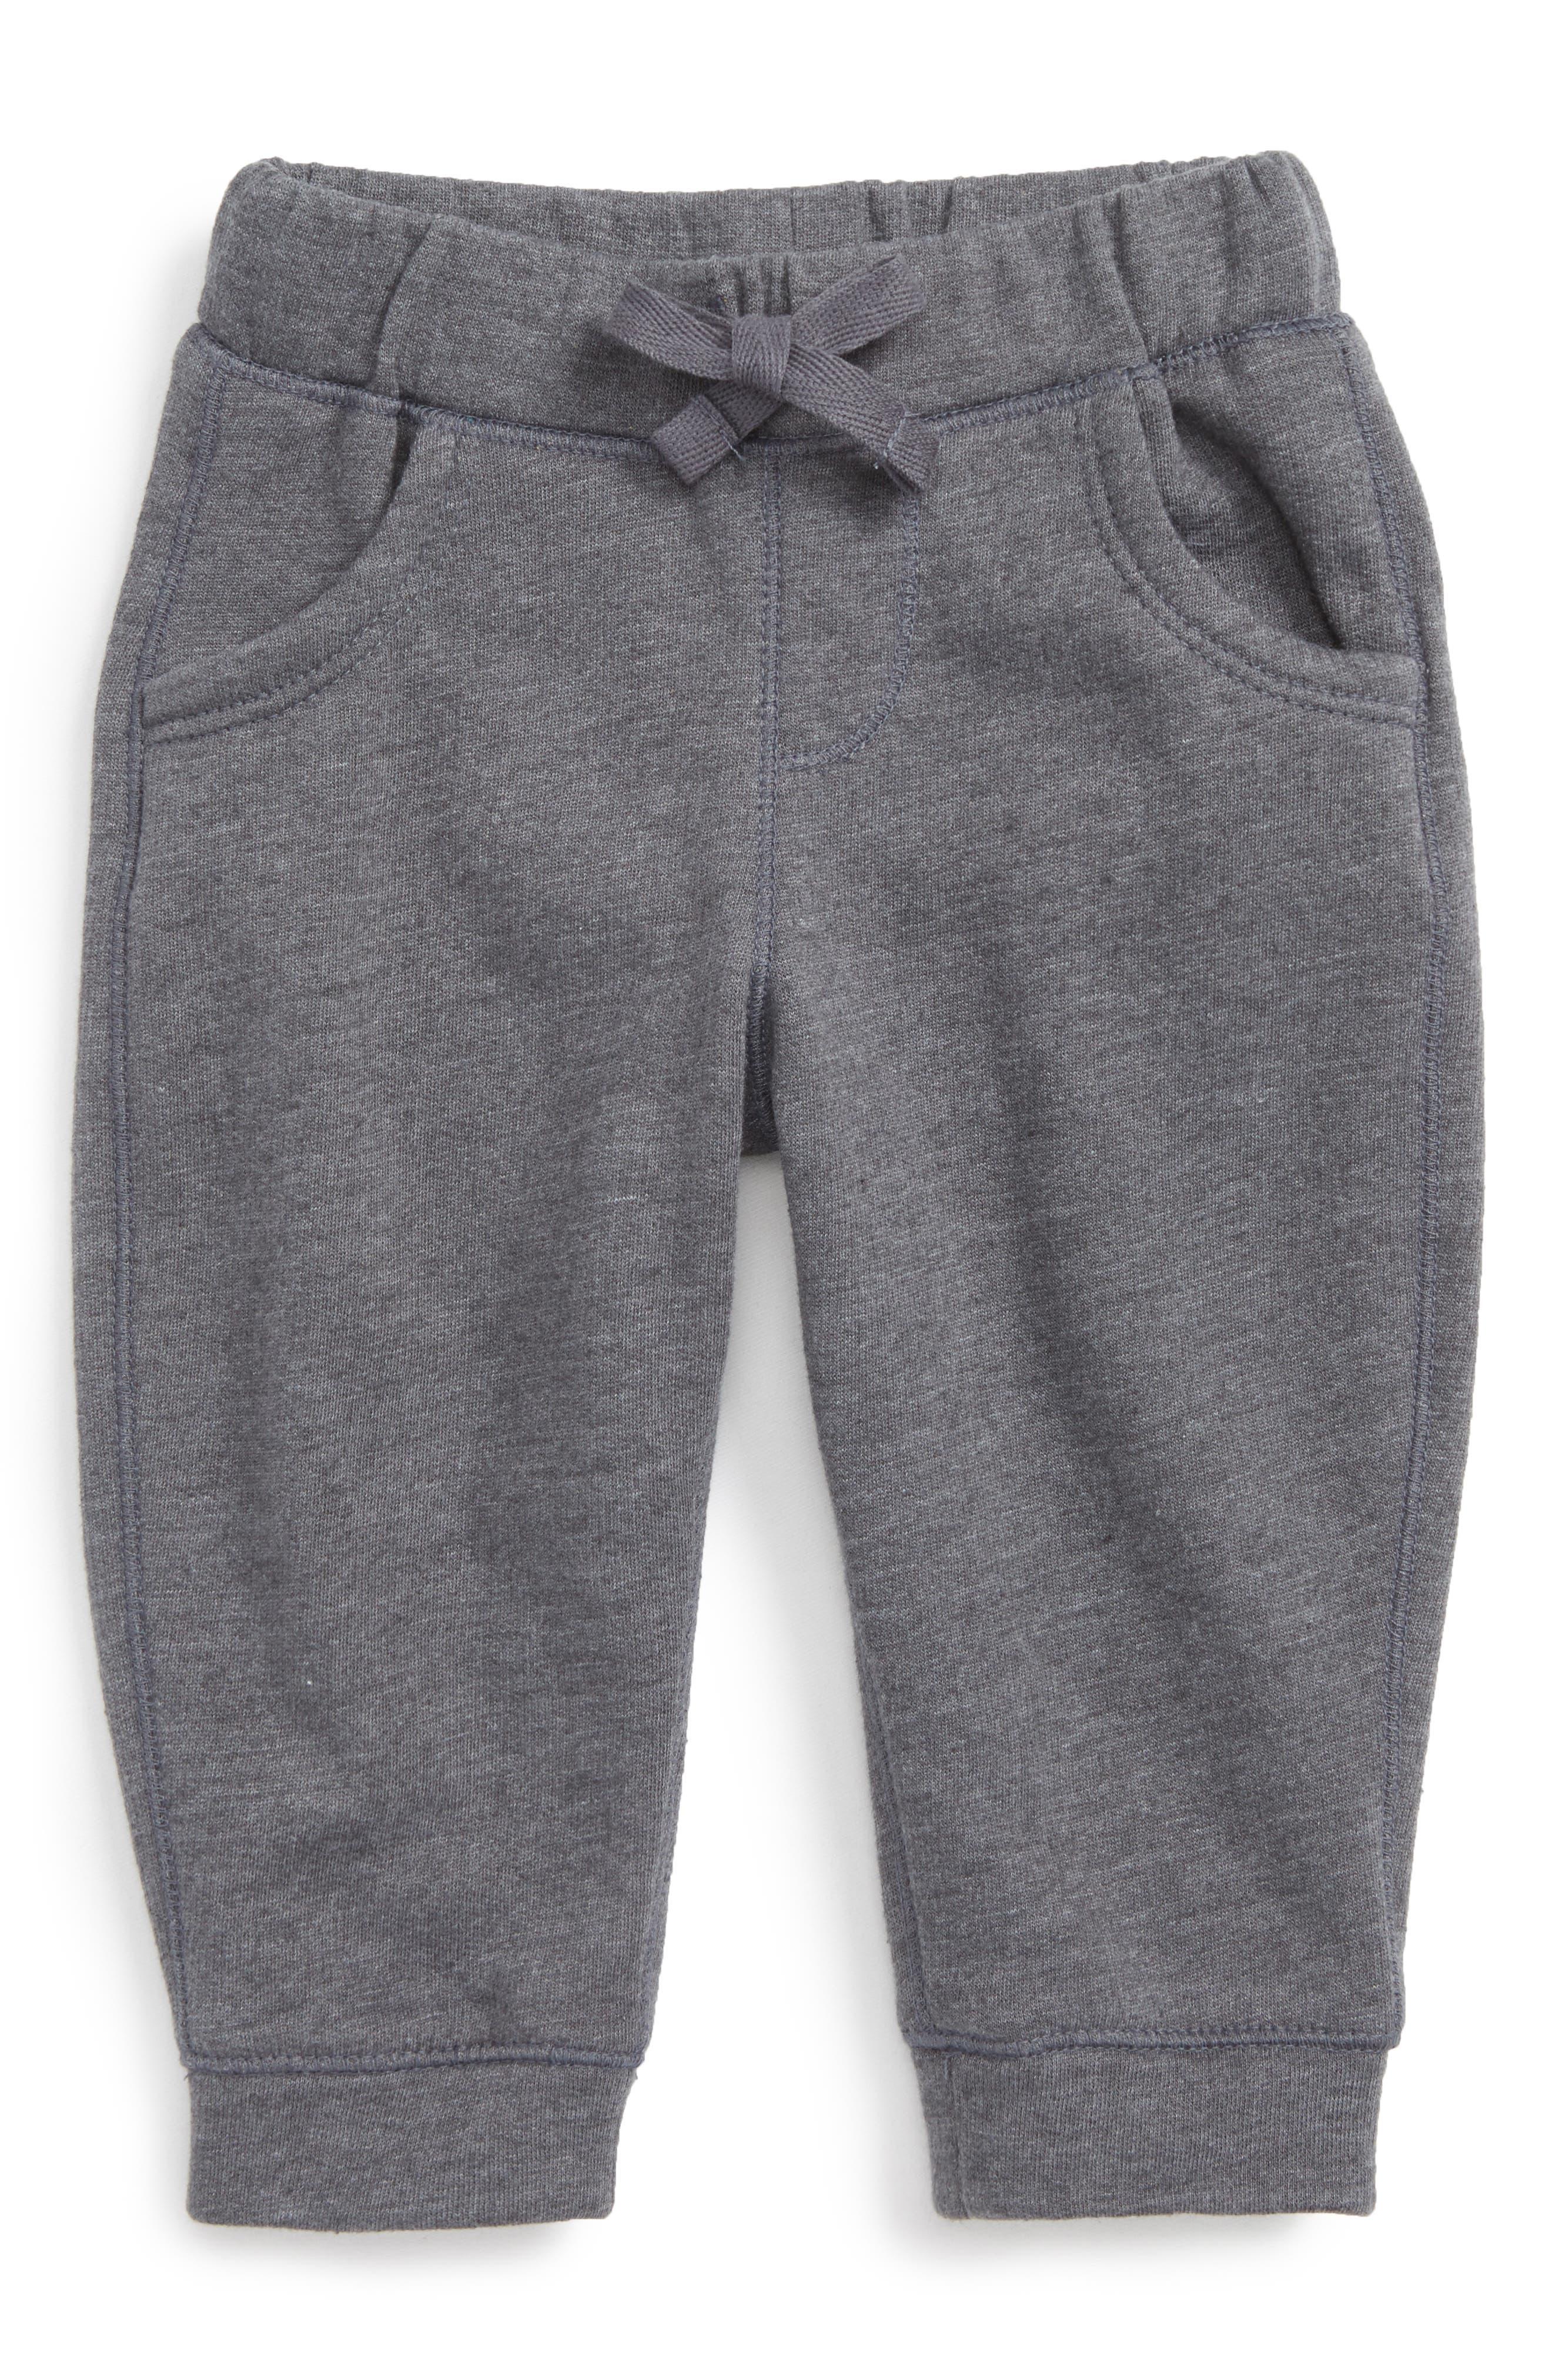 Fleece Sweatpants,                         Main,                         color, GREY CHARCOAL HEATHER